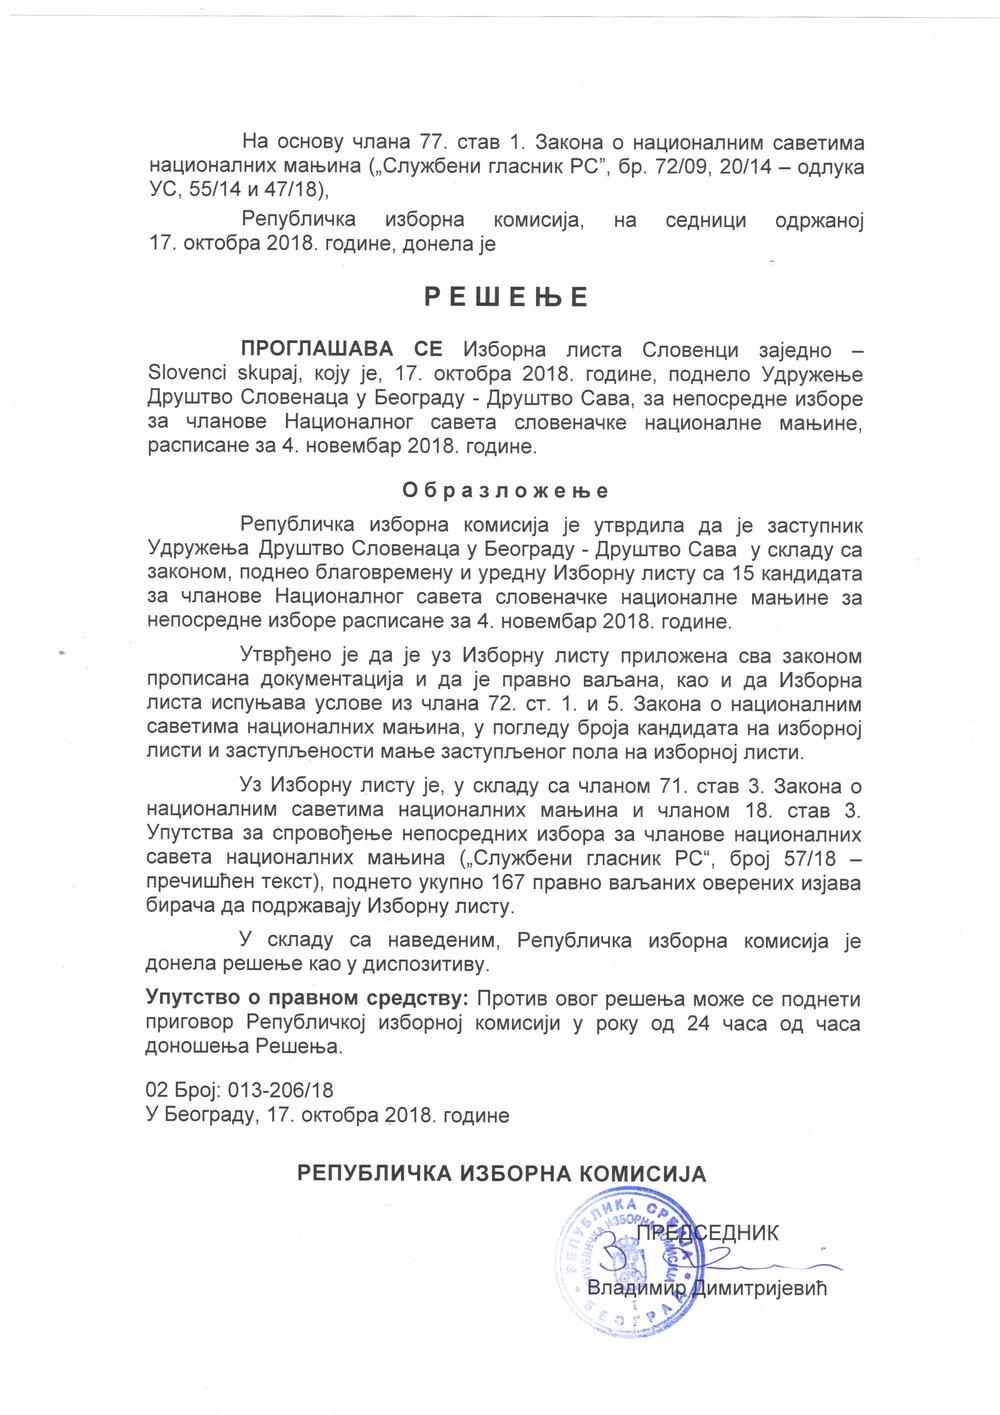 Rešenje o Proglašenju izborne liste Словенци заједно-Slovenci skupaj.jpg